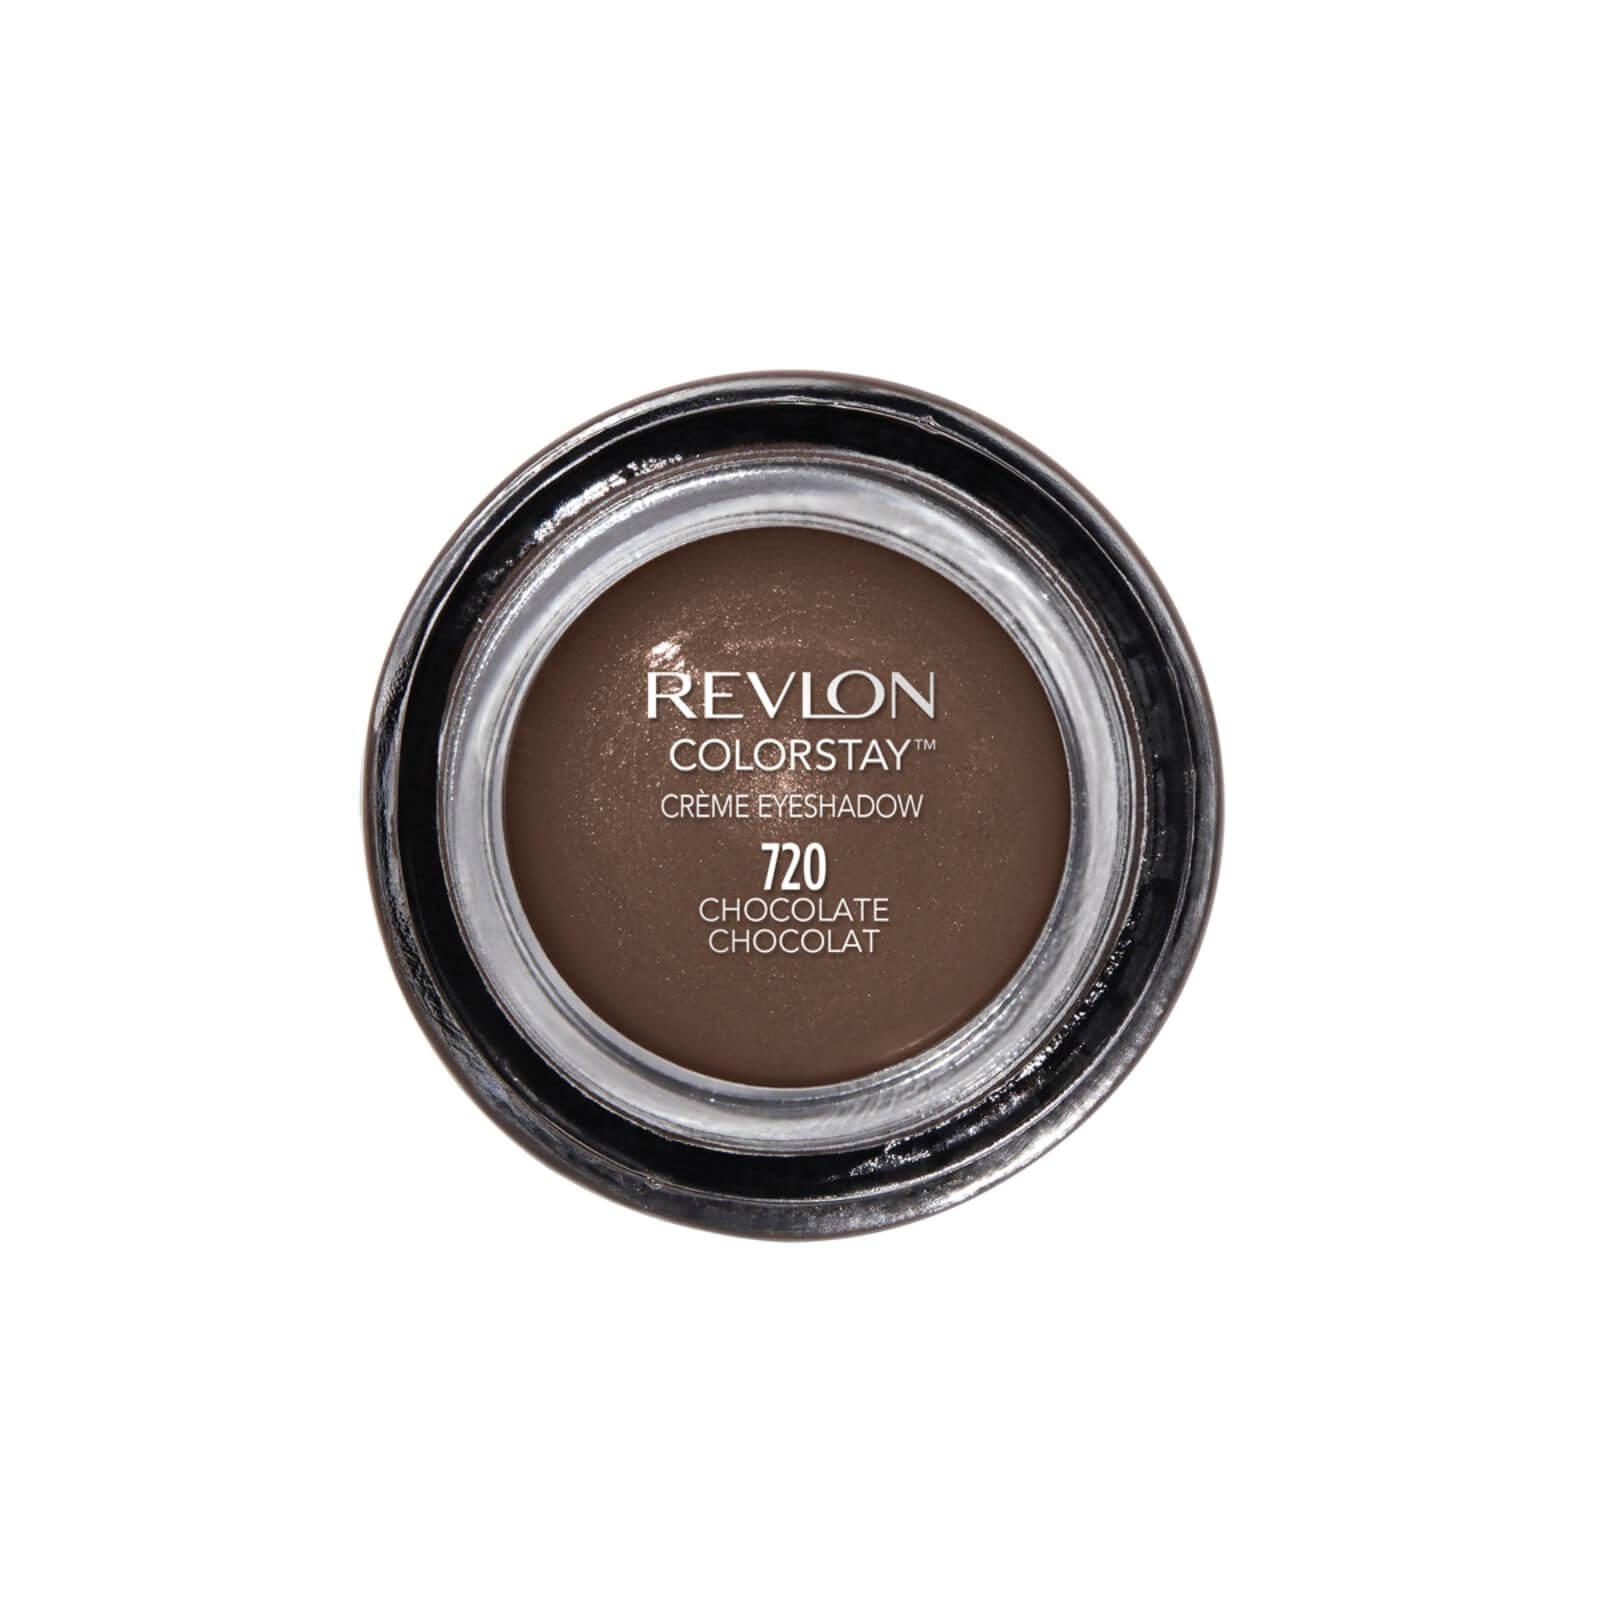 Revlon Colorstay Crème Eye Shadow (Various Shades) - Chocolate